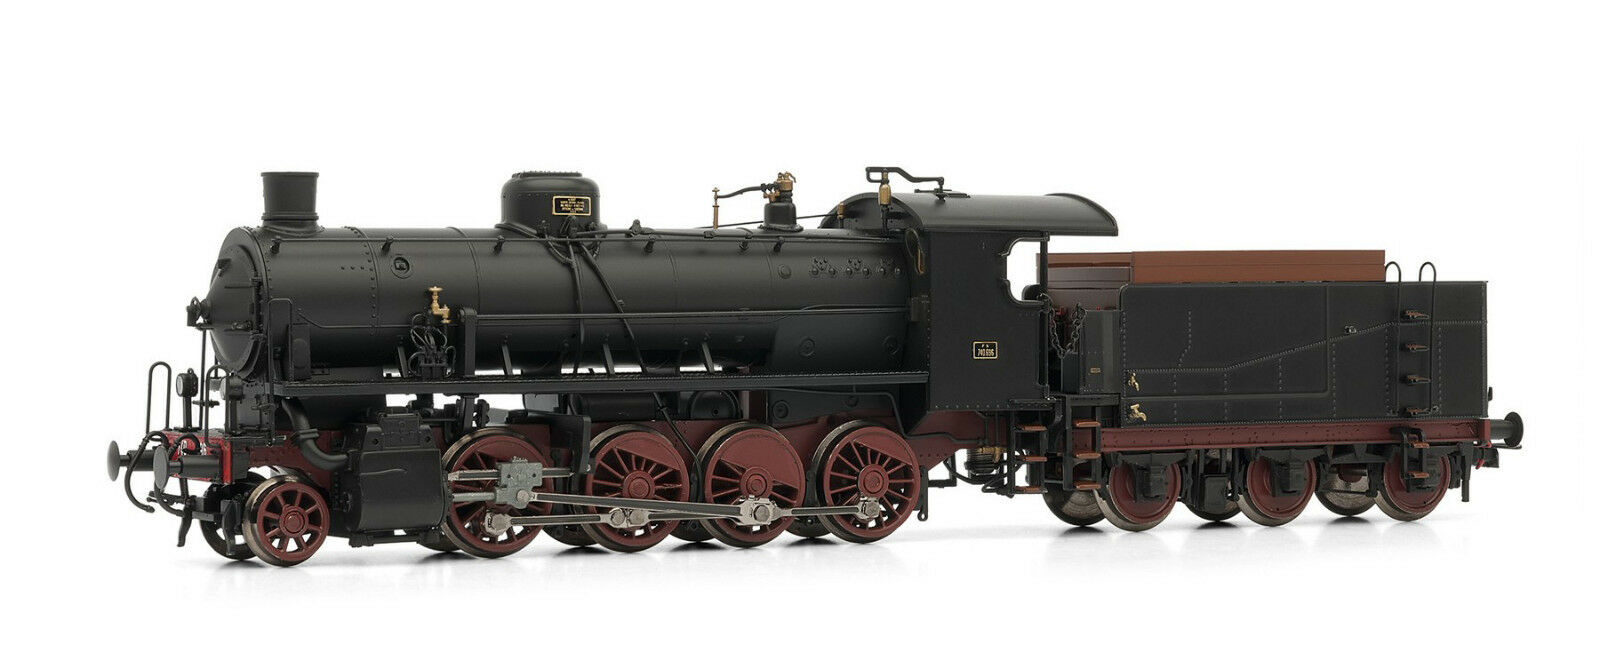 Rivarossi hr2483 damflokomotive 740 696 Caprossoti FS analógico New